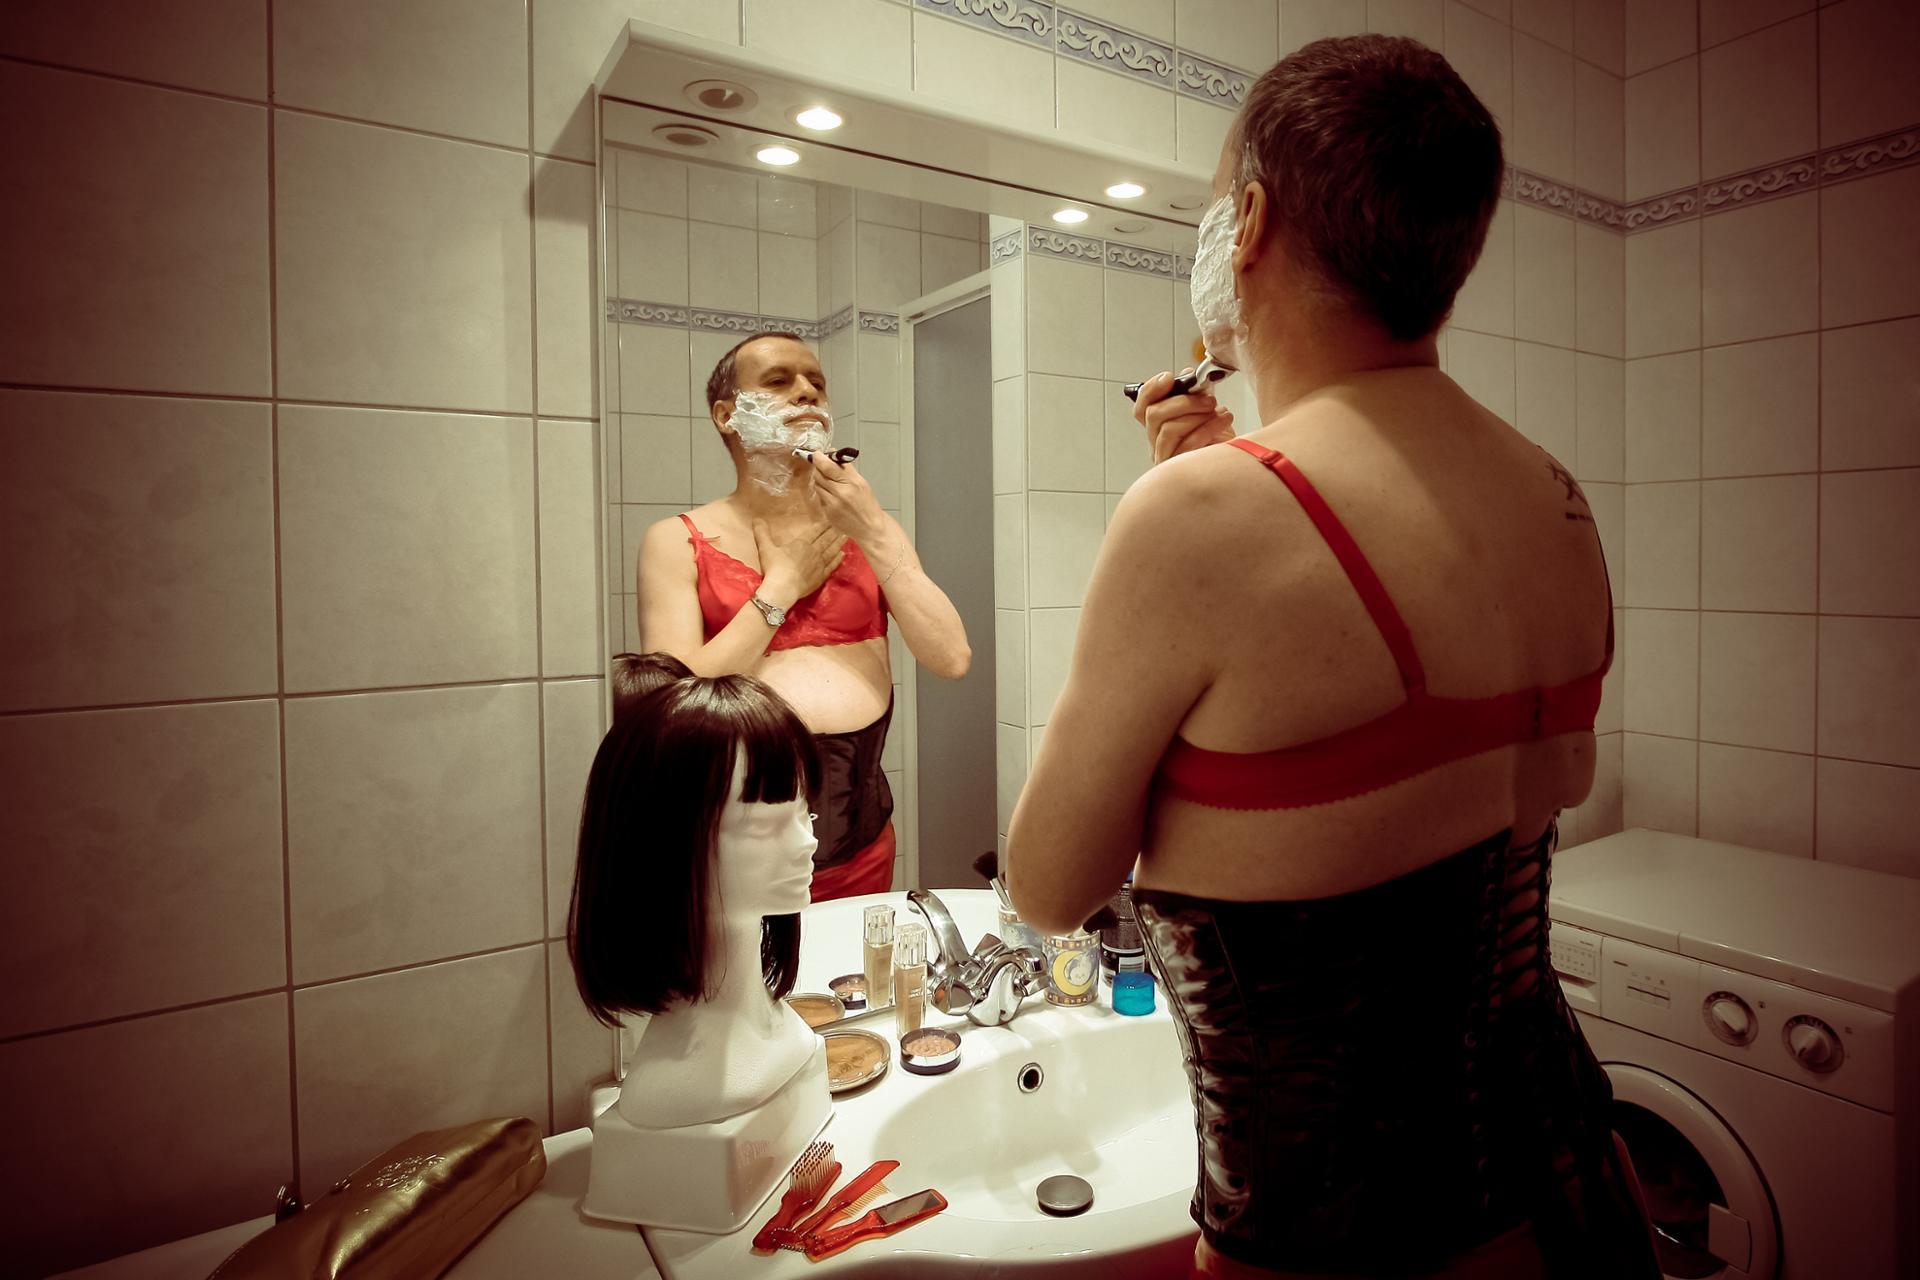 L'Homme-Femme à Barbe